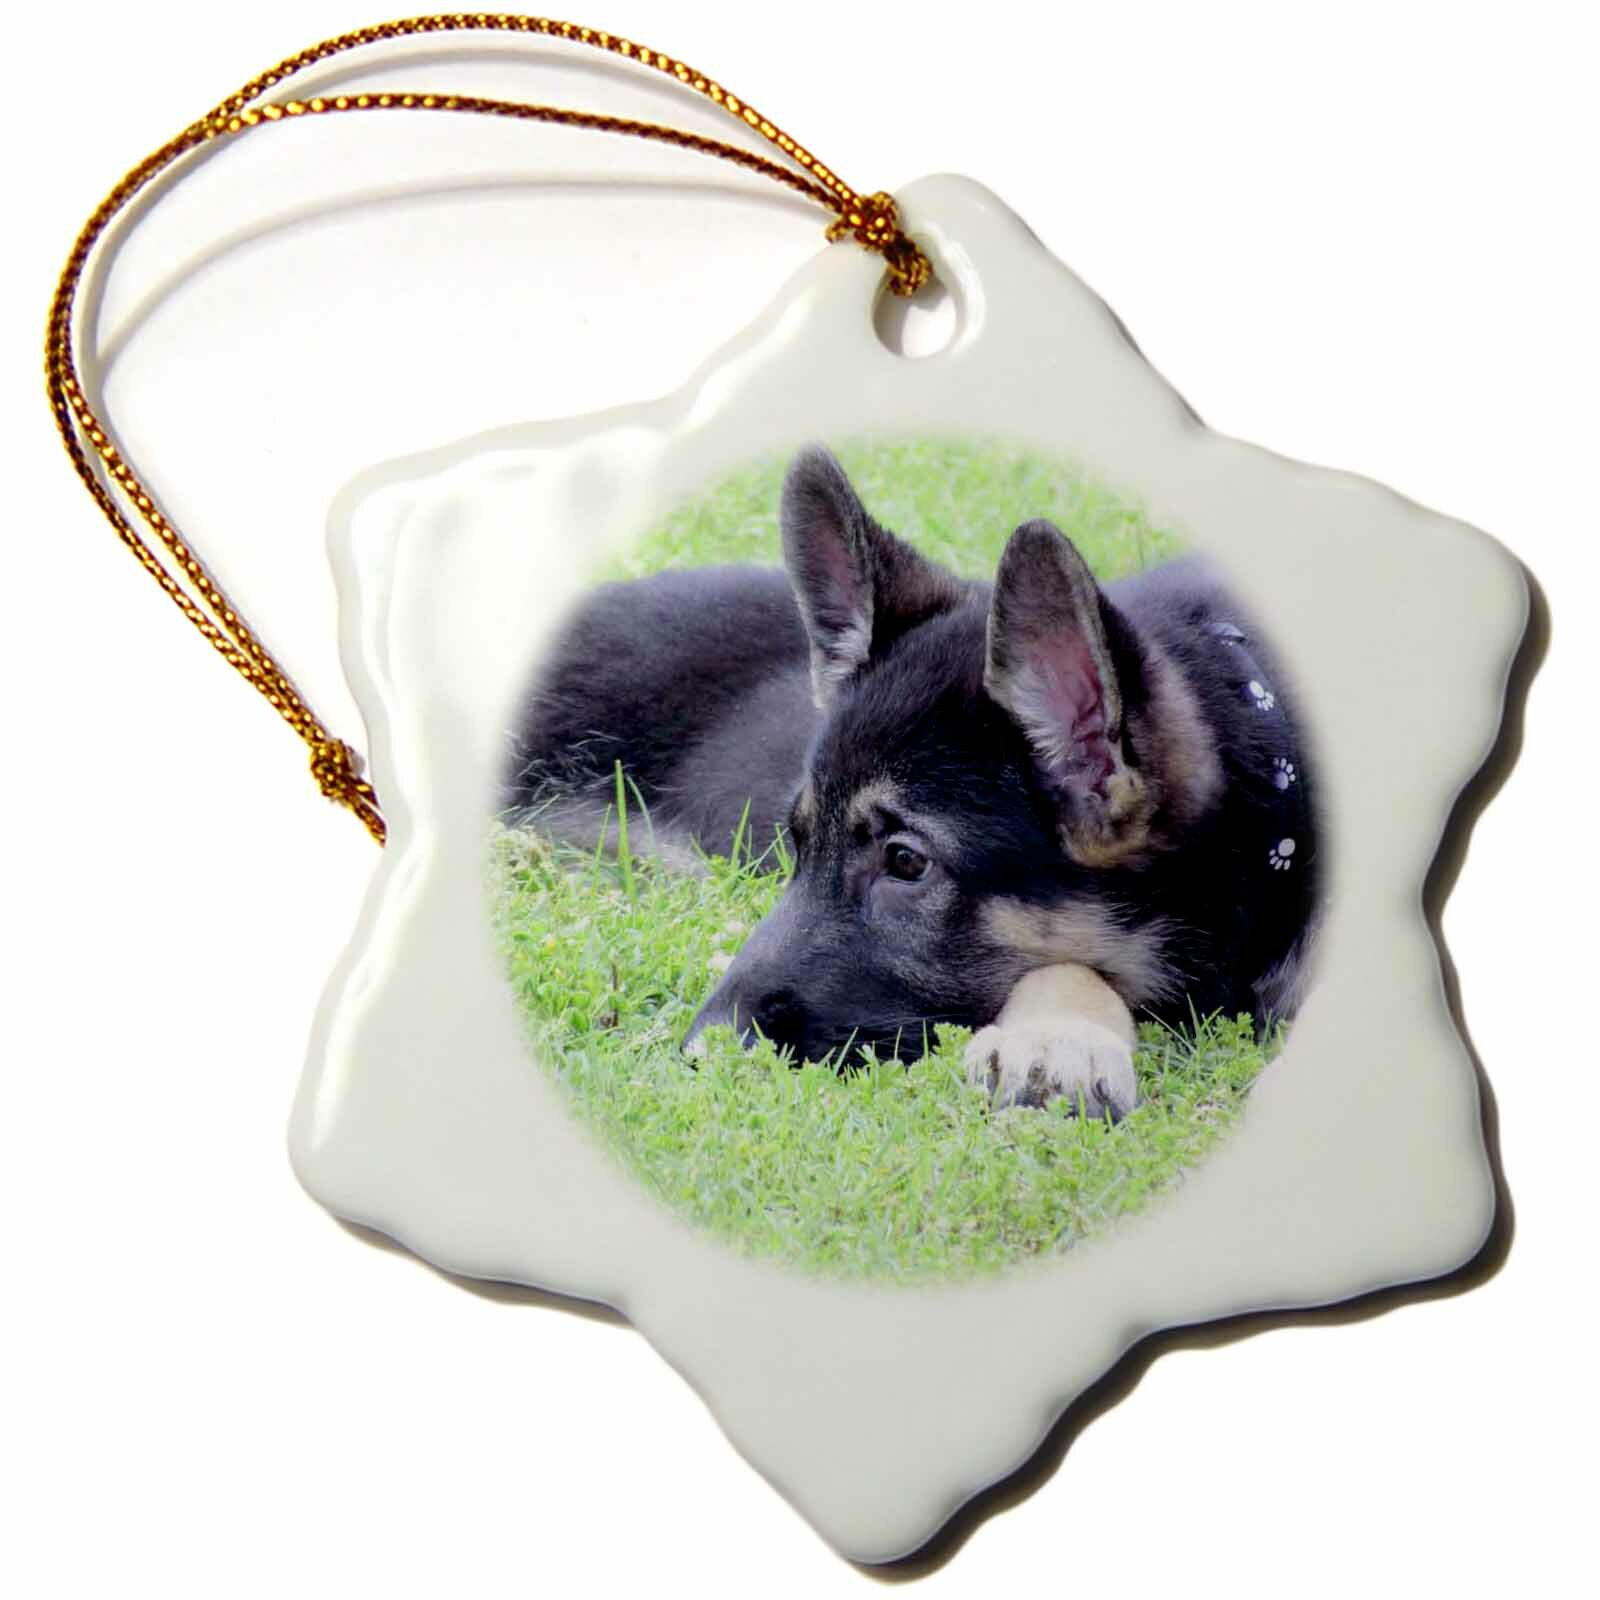 The Holiday Aisle German Shepherd Puppy Snowflake Holiday Shaped Ornament Wayfair